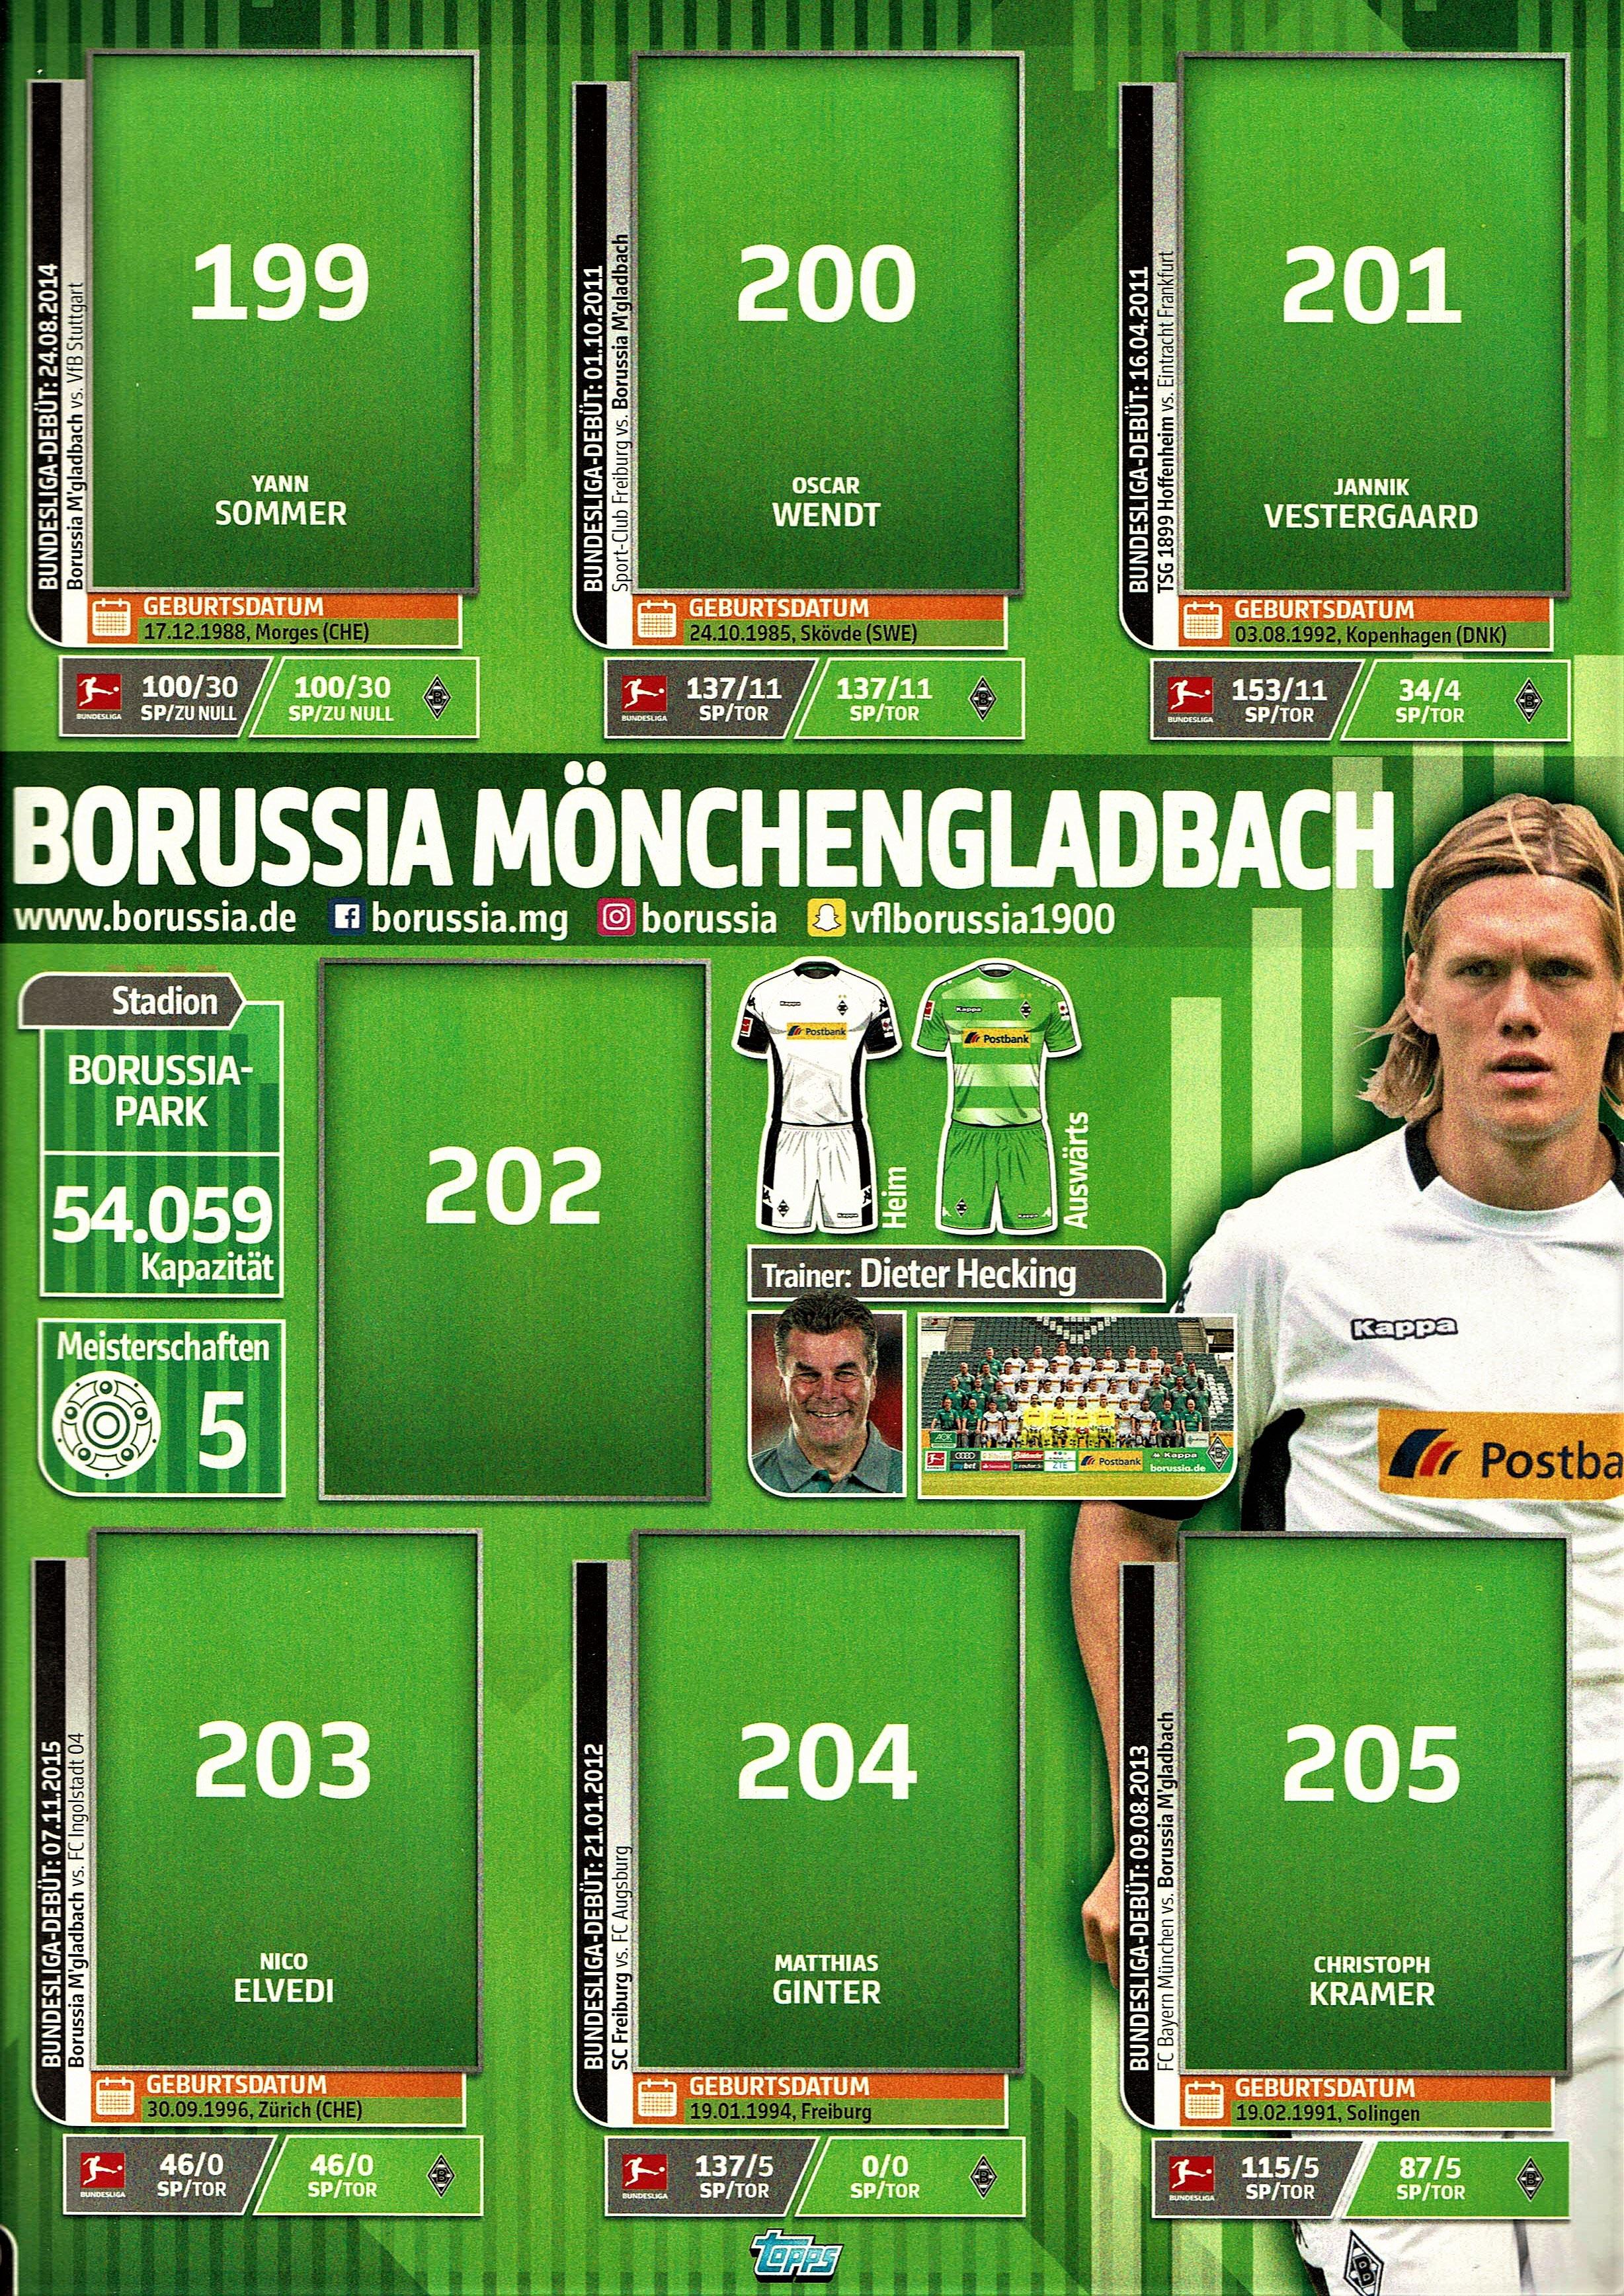 Jannik Vestergaard TOPPS Bundesliga 2017//2018 Sticker 201